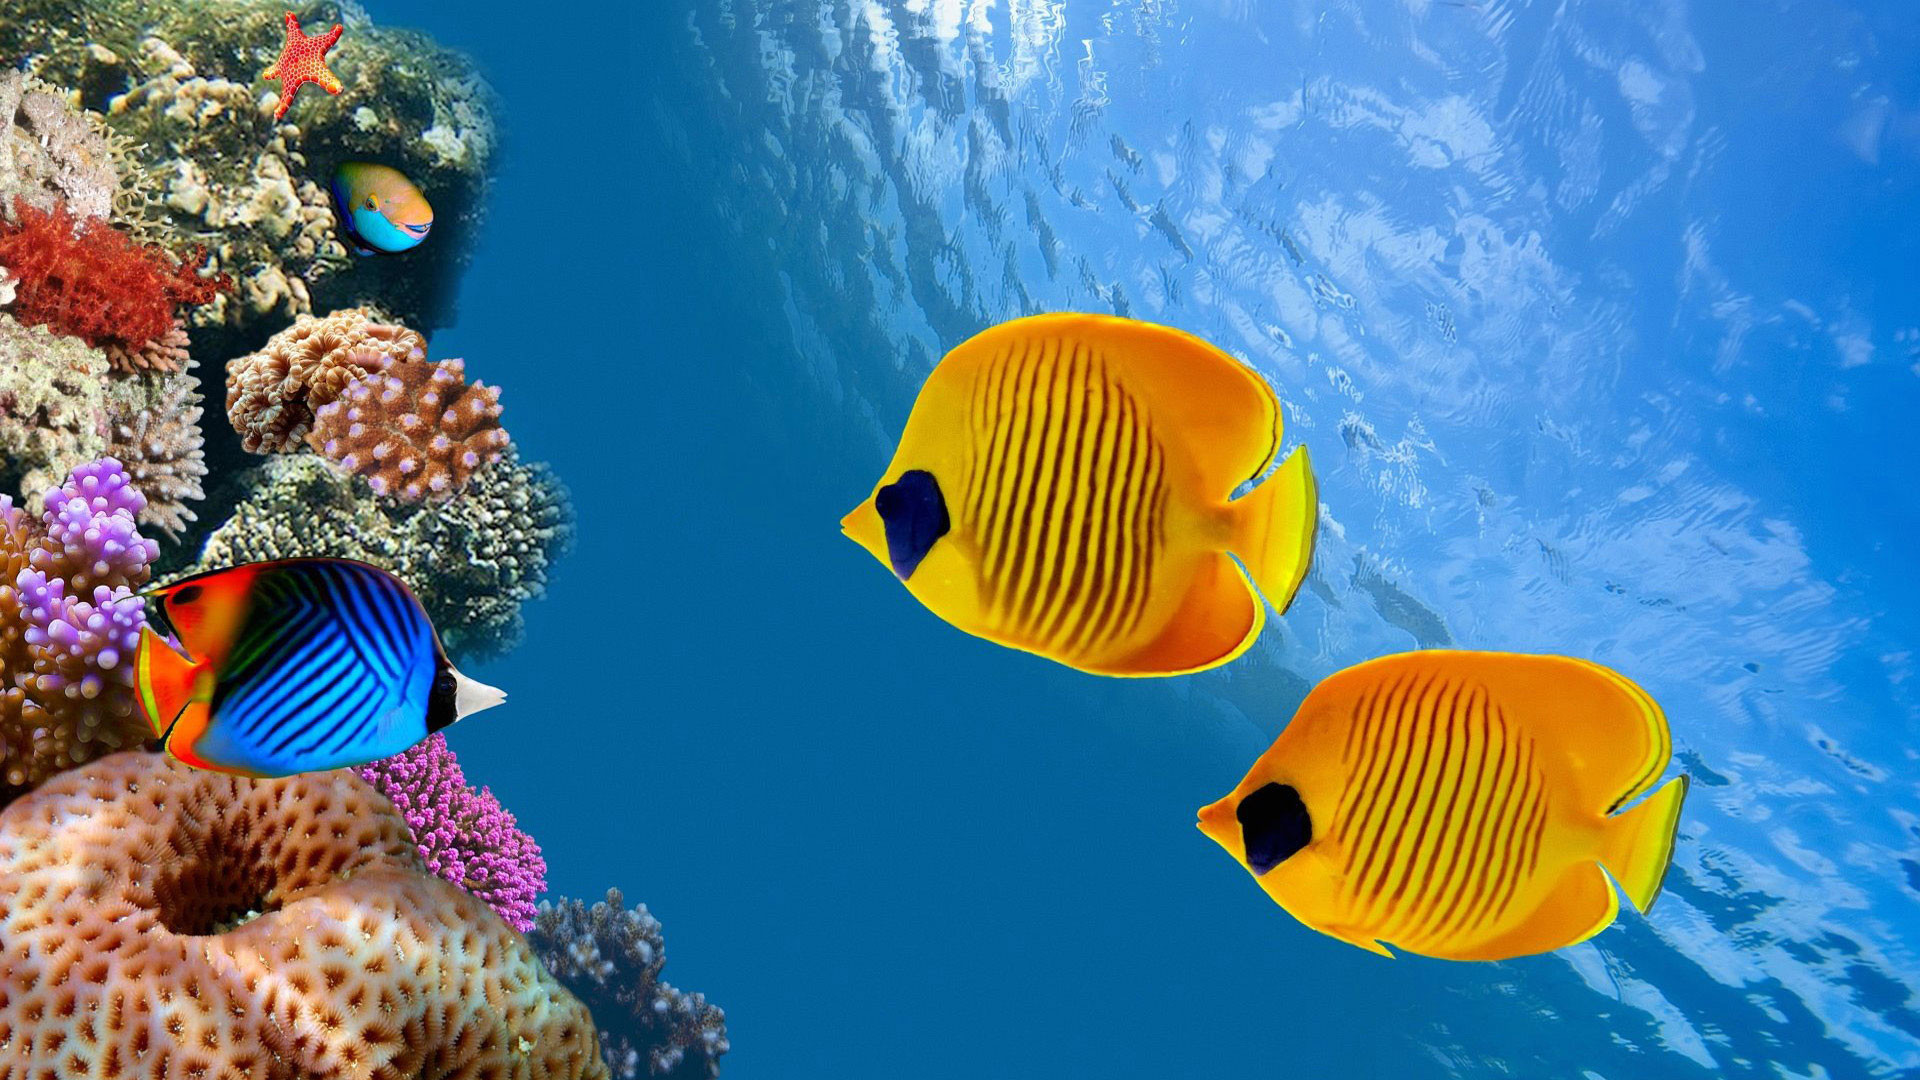 hd pics photos fish marine sea beautiful desktop background wallpaper